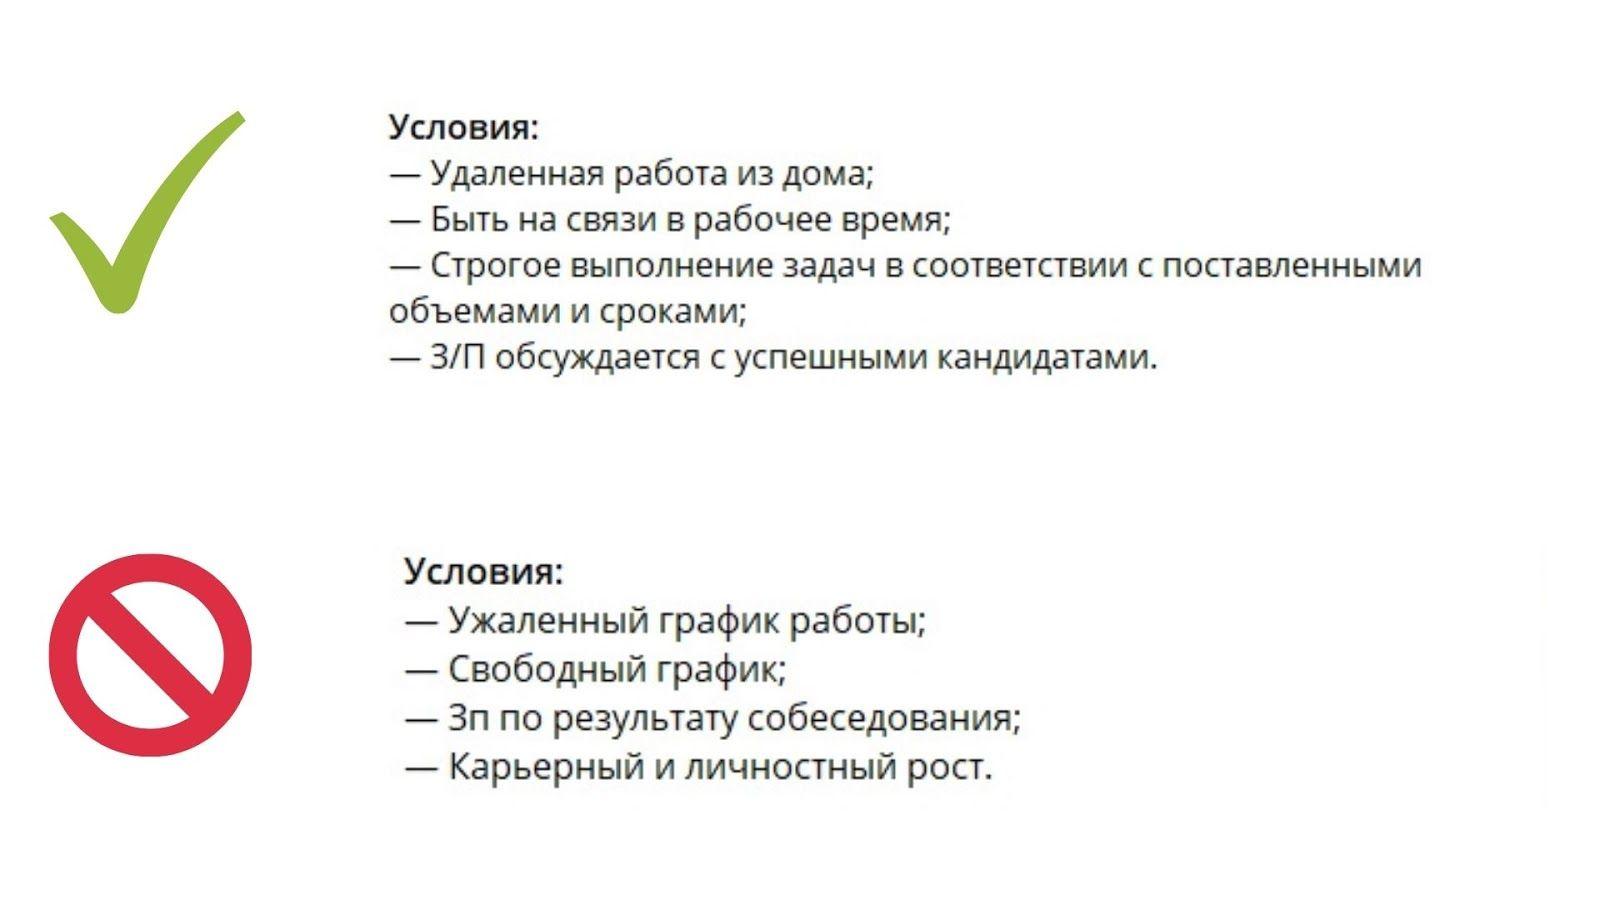 Сравнение условий